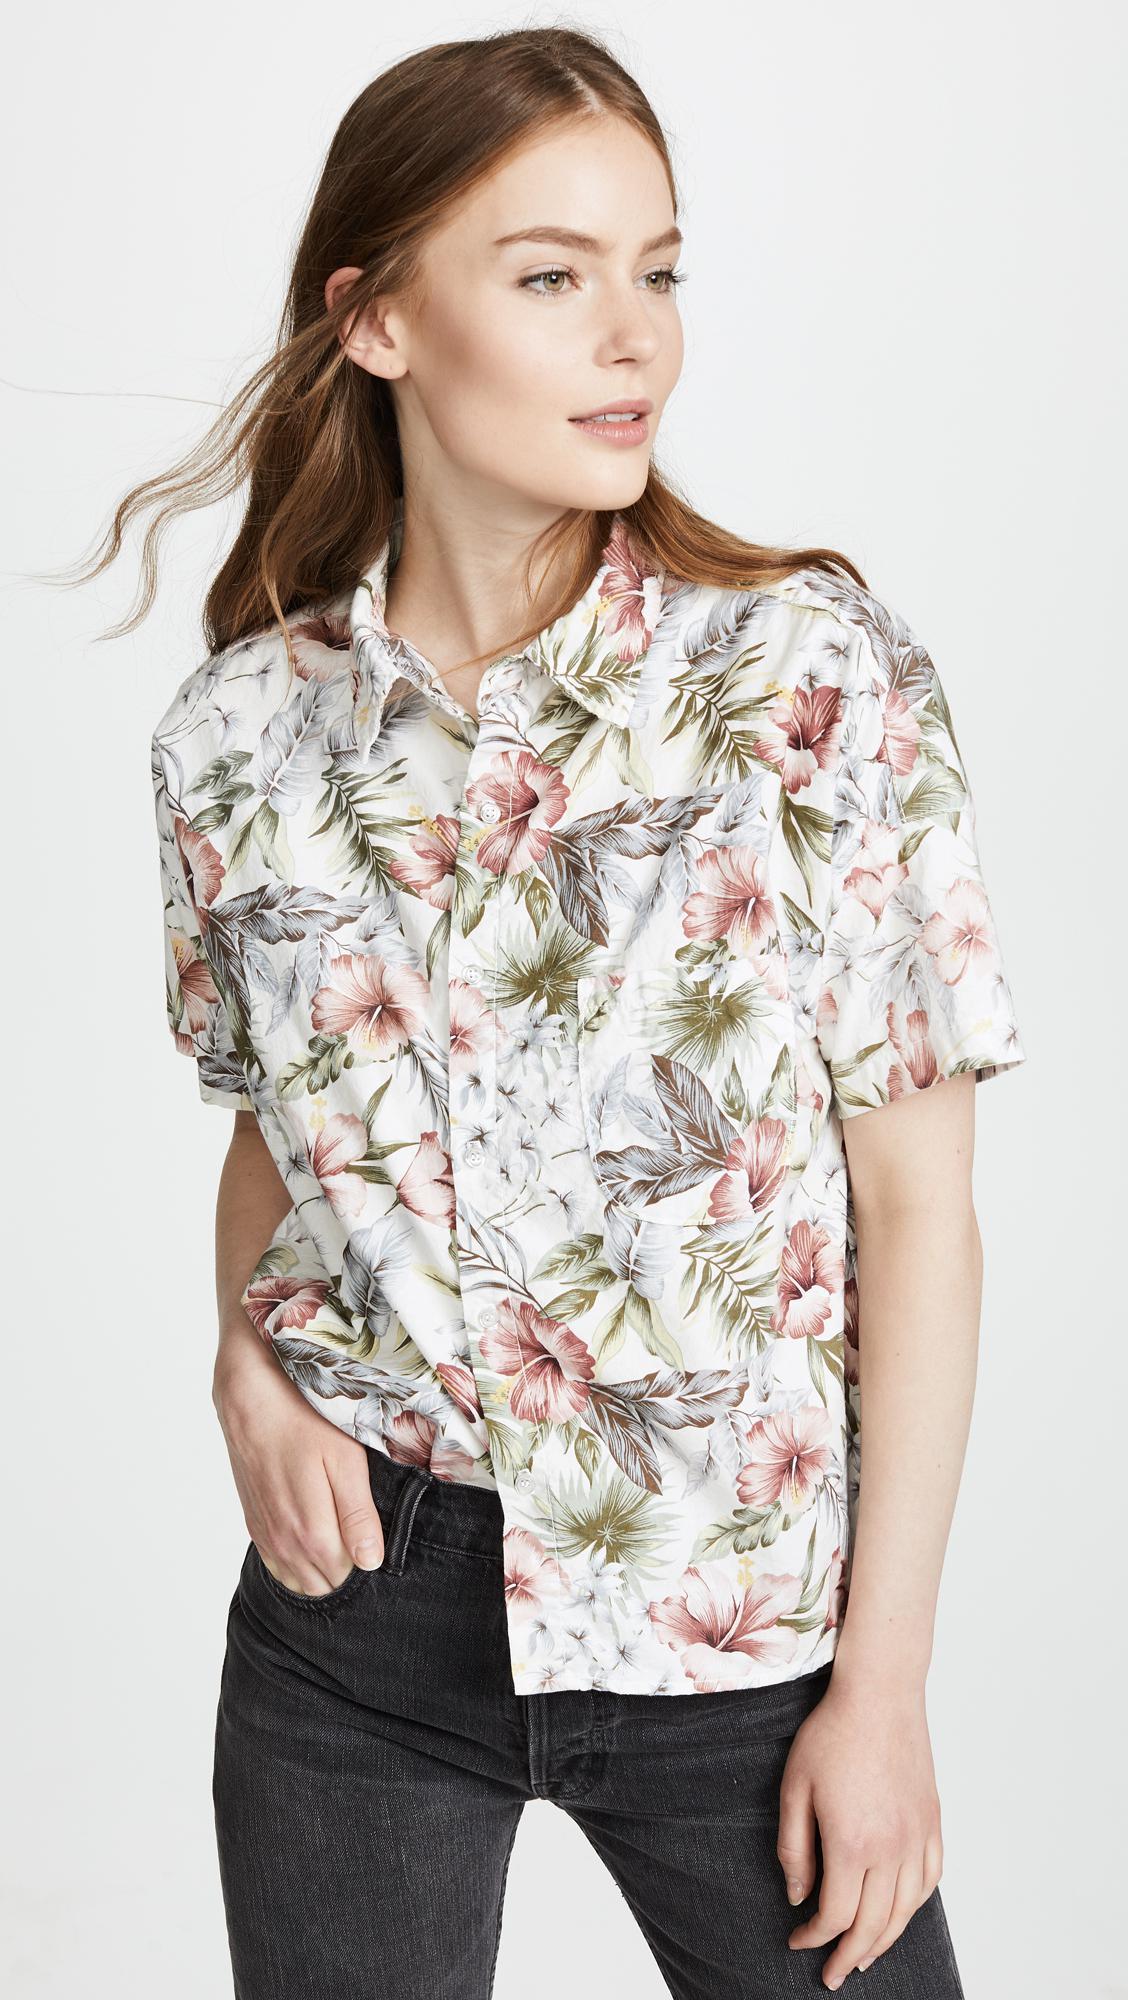 Womens Tanis Floral Cotton Blouse NSF Discount Shop For uXTZbBKtW